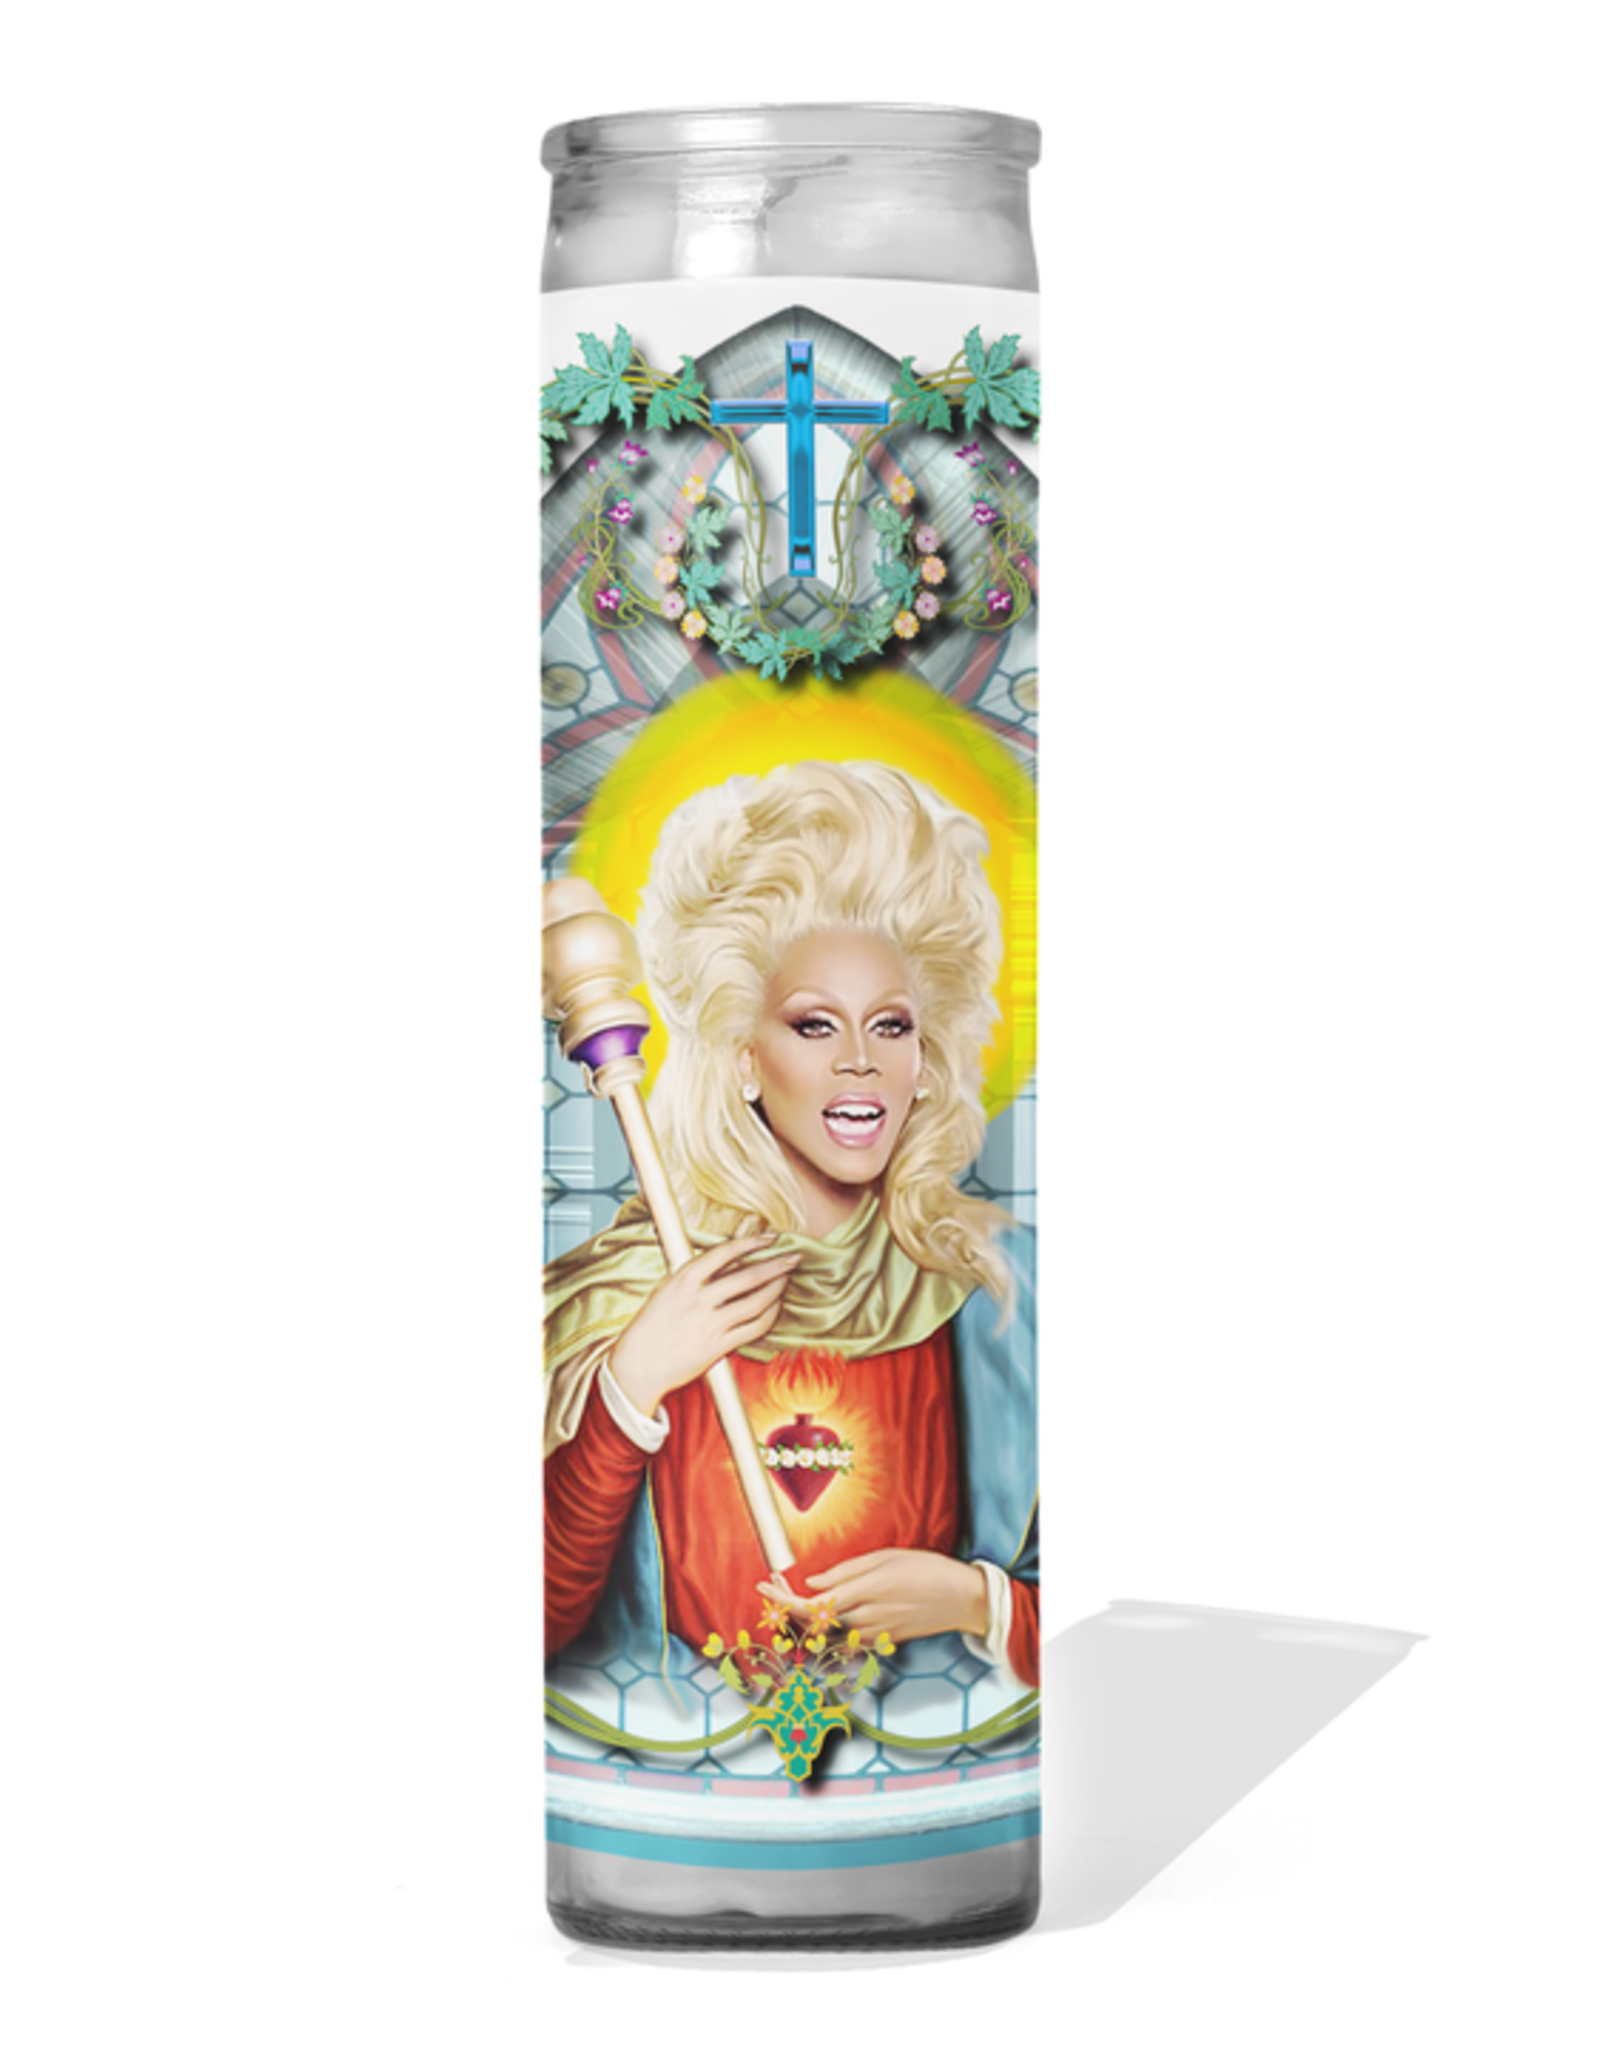 Calm Down Caren RuPaul Celebrity Prayer Candle